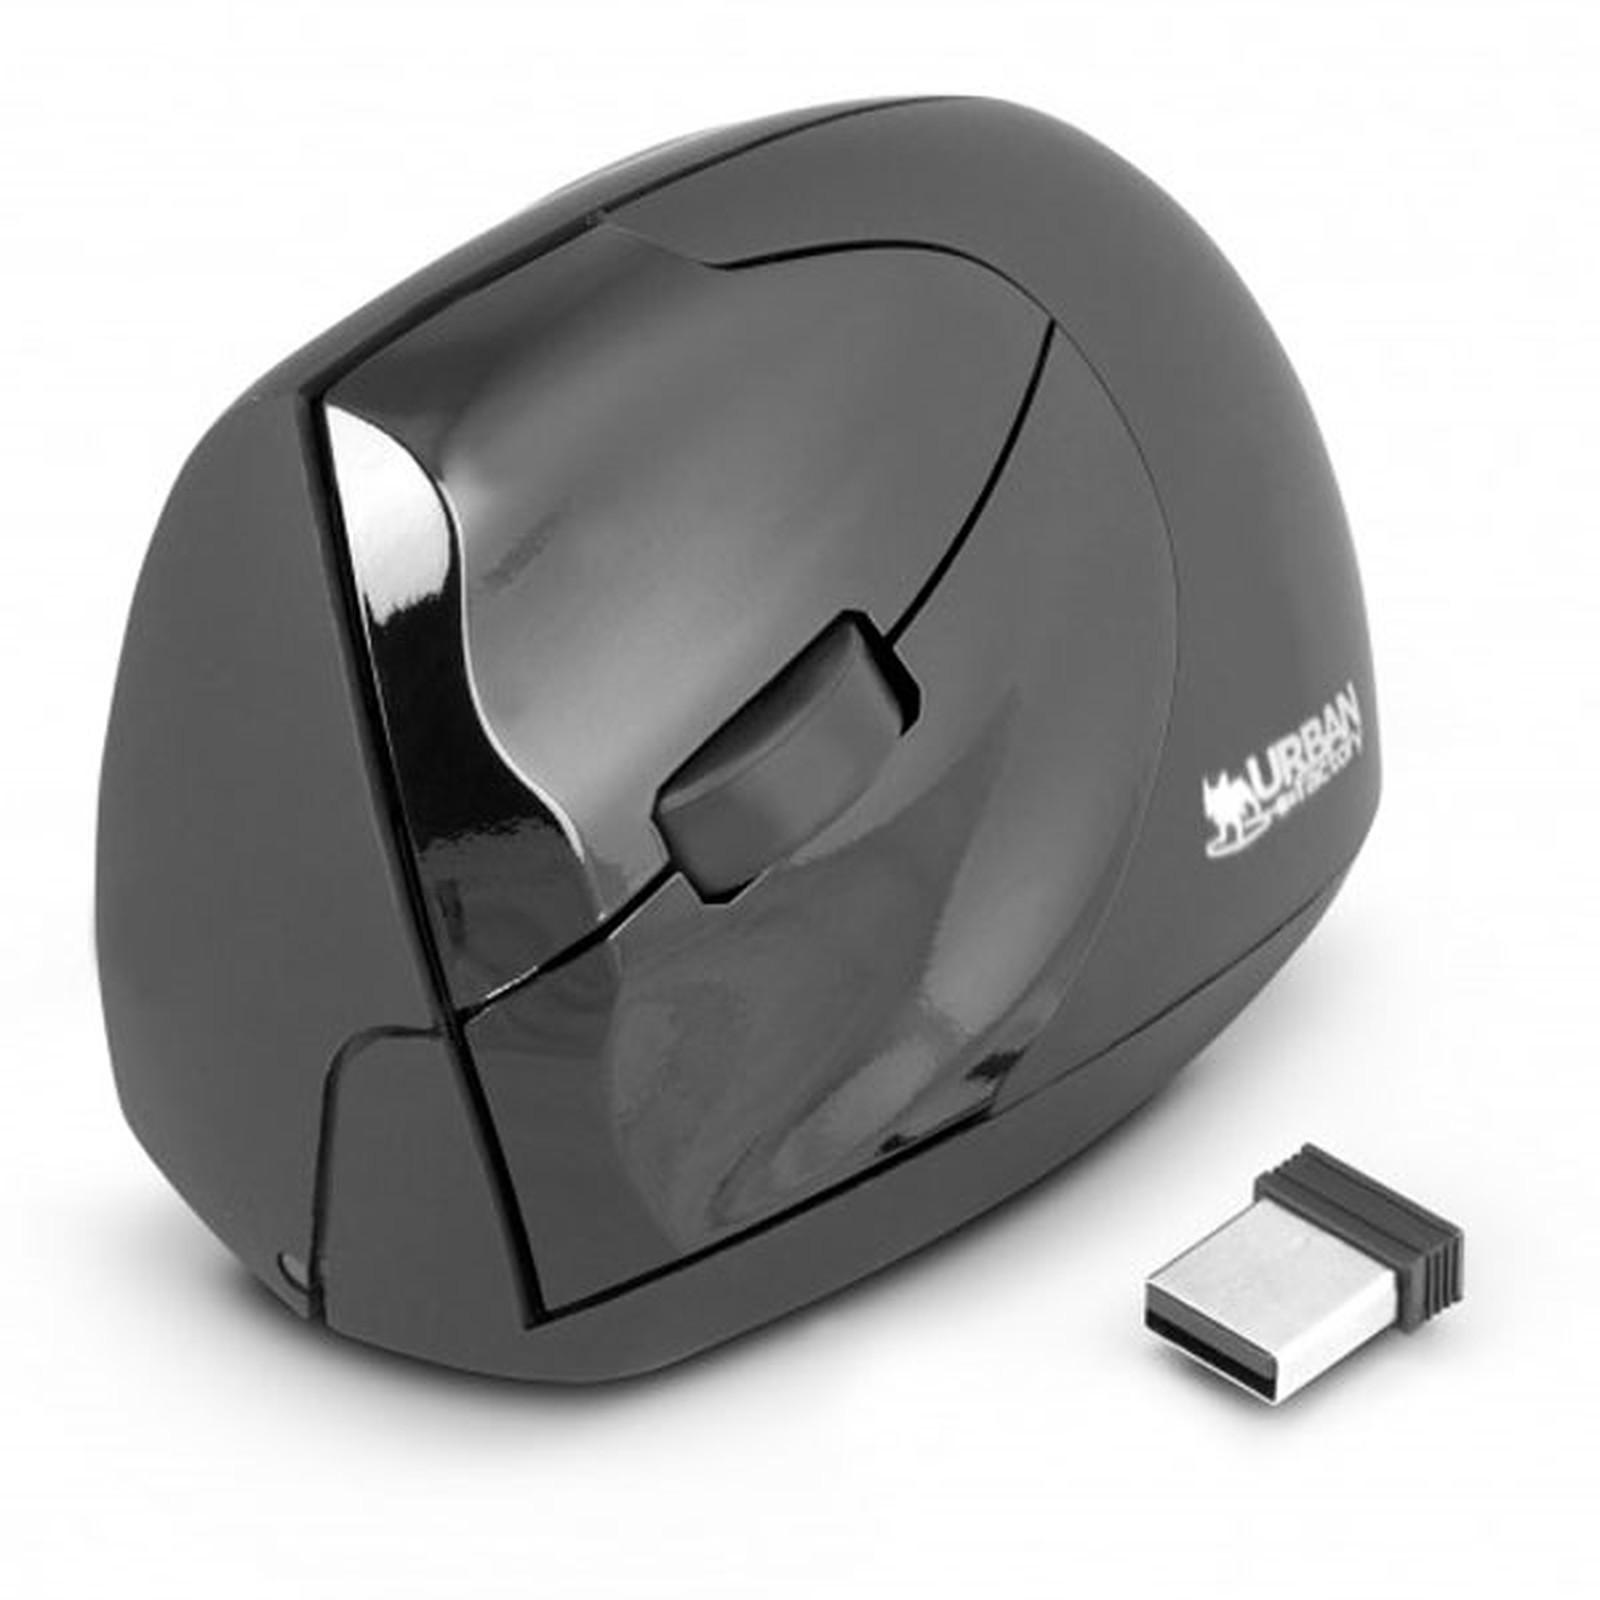 Urban Factory Wireless Ergo Mouse (pour gaucher)